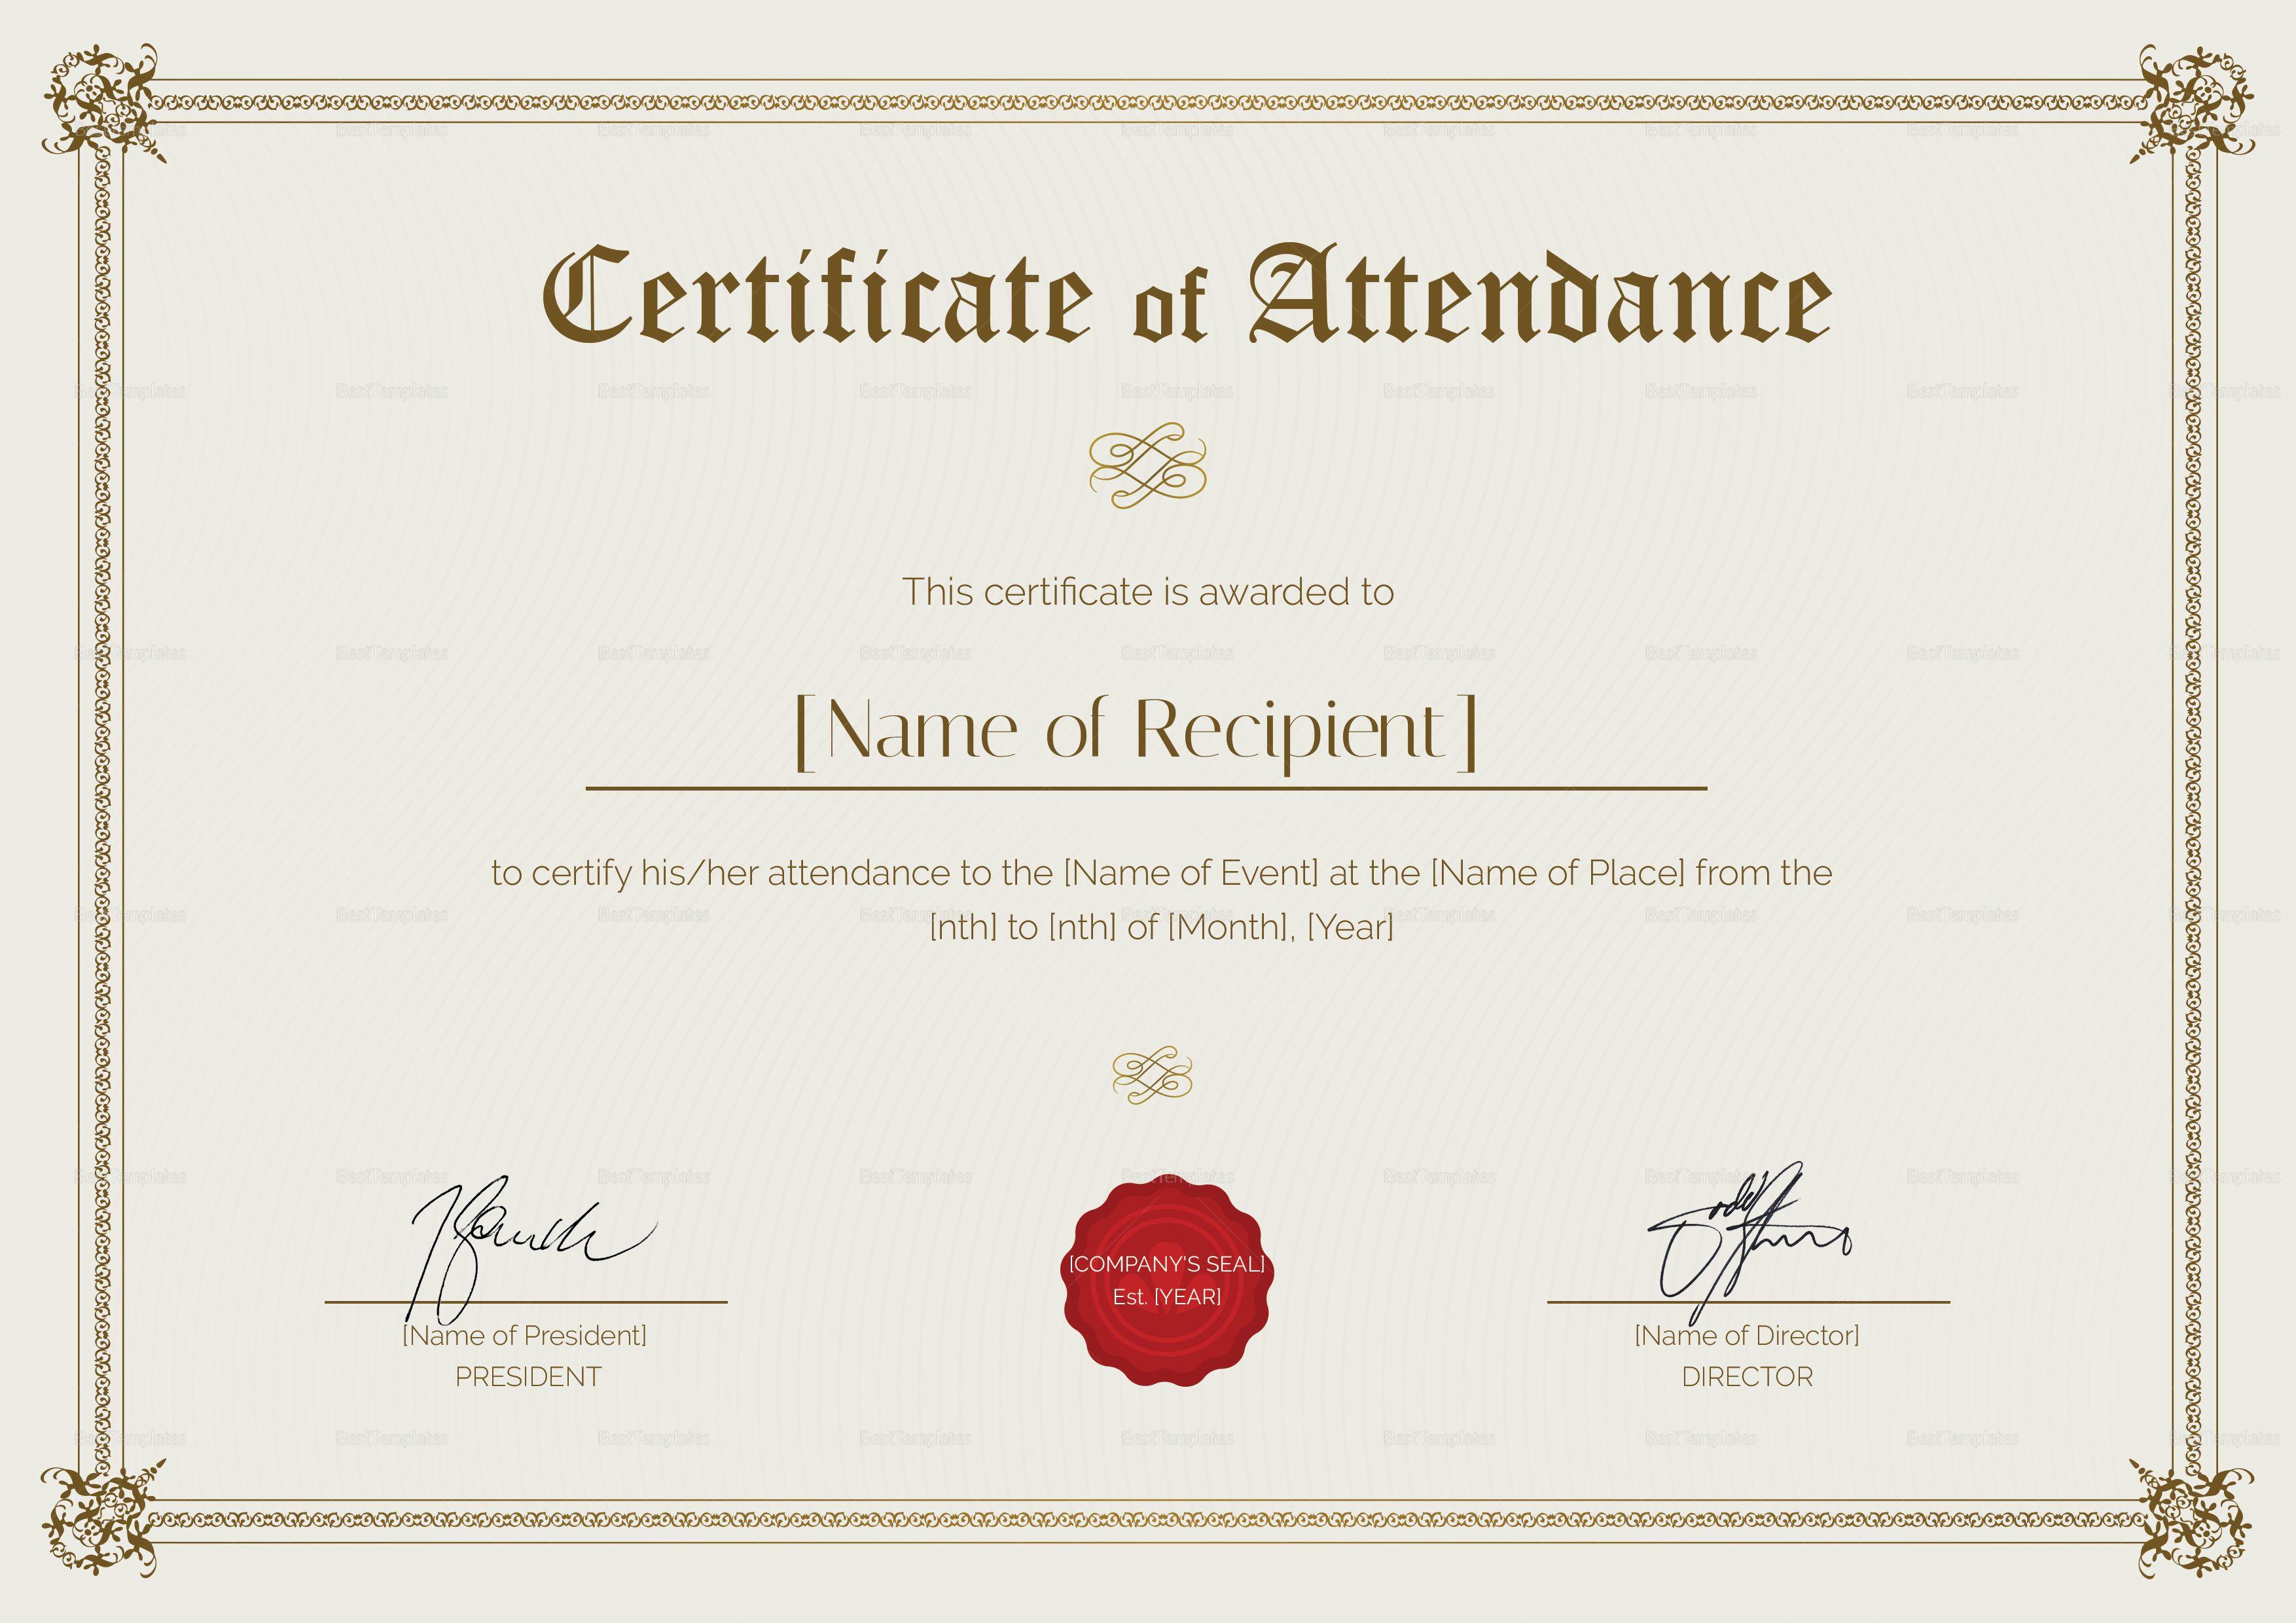 Certificate Of Attendance Template Business Template Certificate Design Template Free Gift Certificate Template Free printable certificate of attendance template